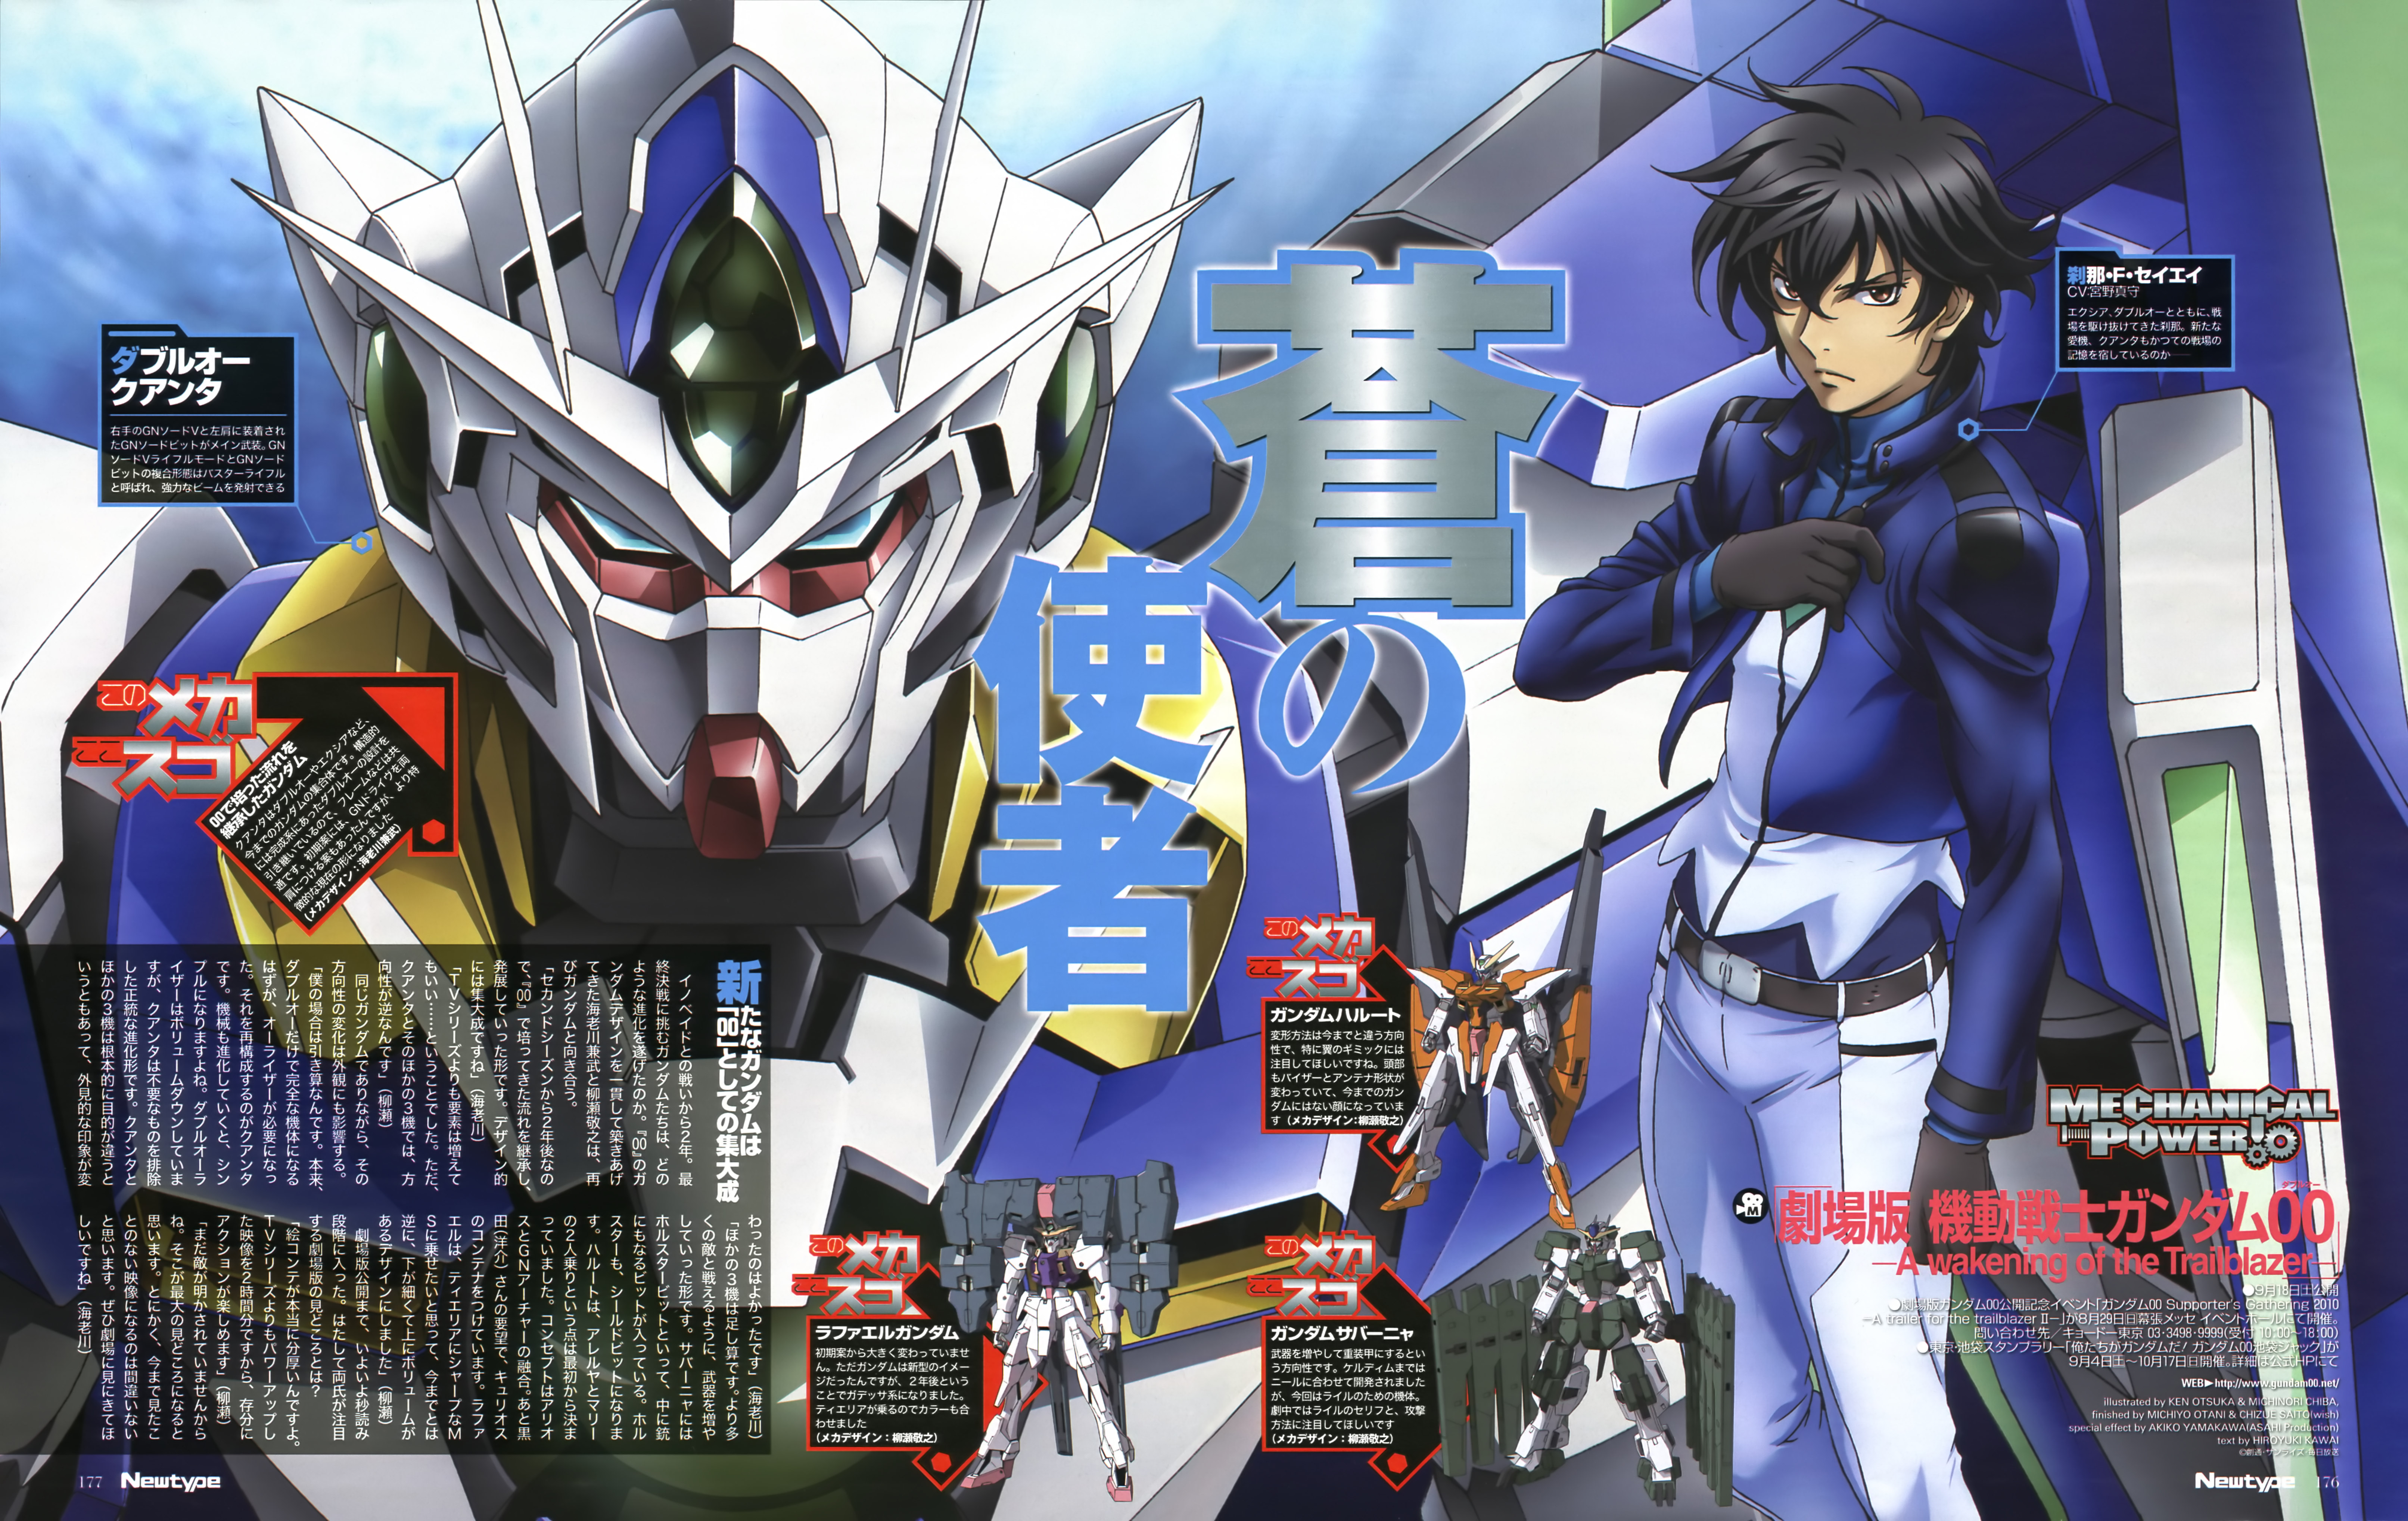 Mobile Suit Gundam 00 Setsuna F Seiei Minitokyo